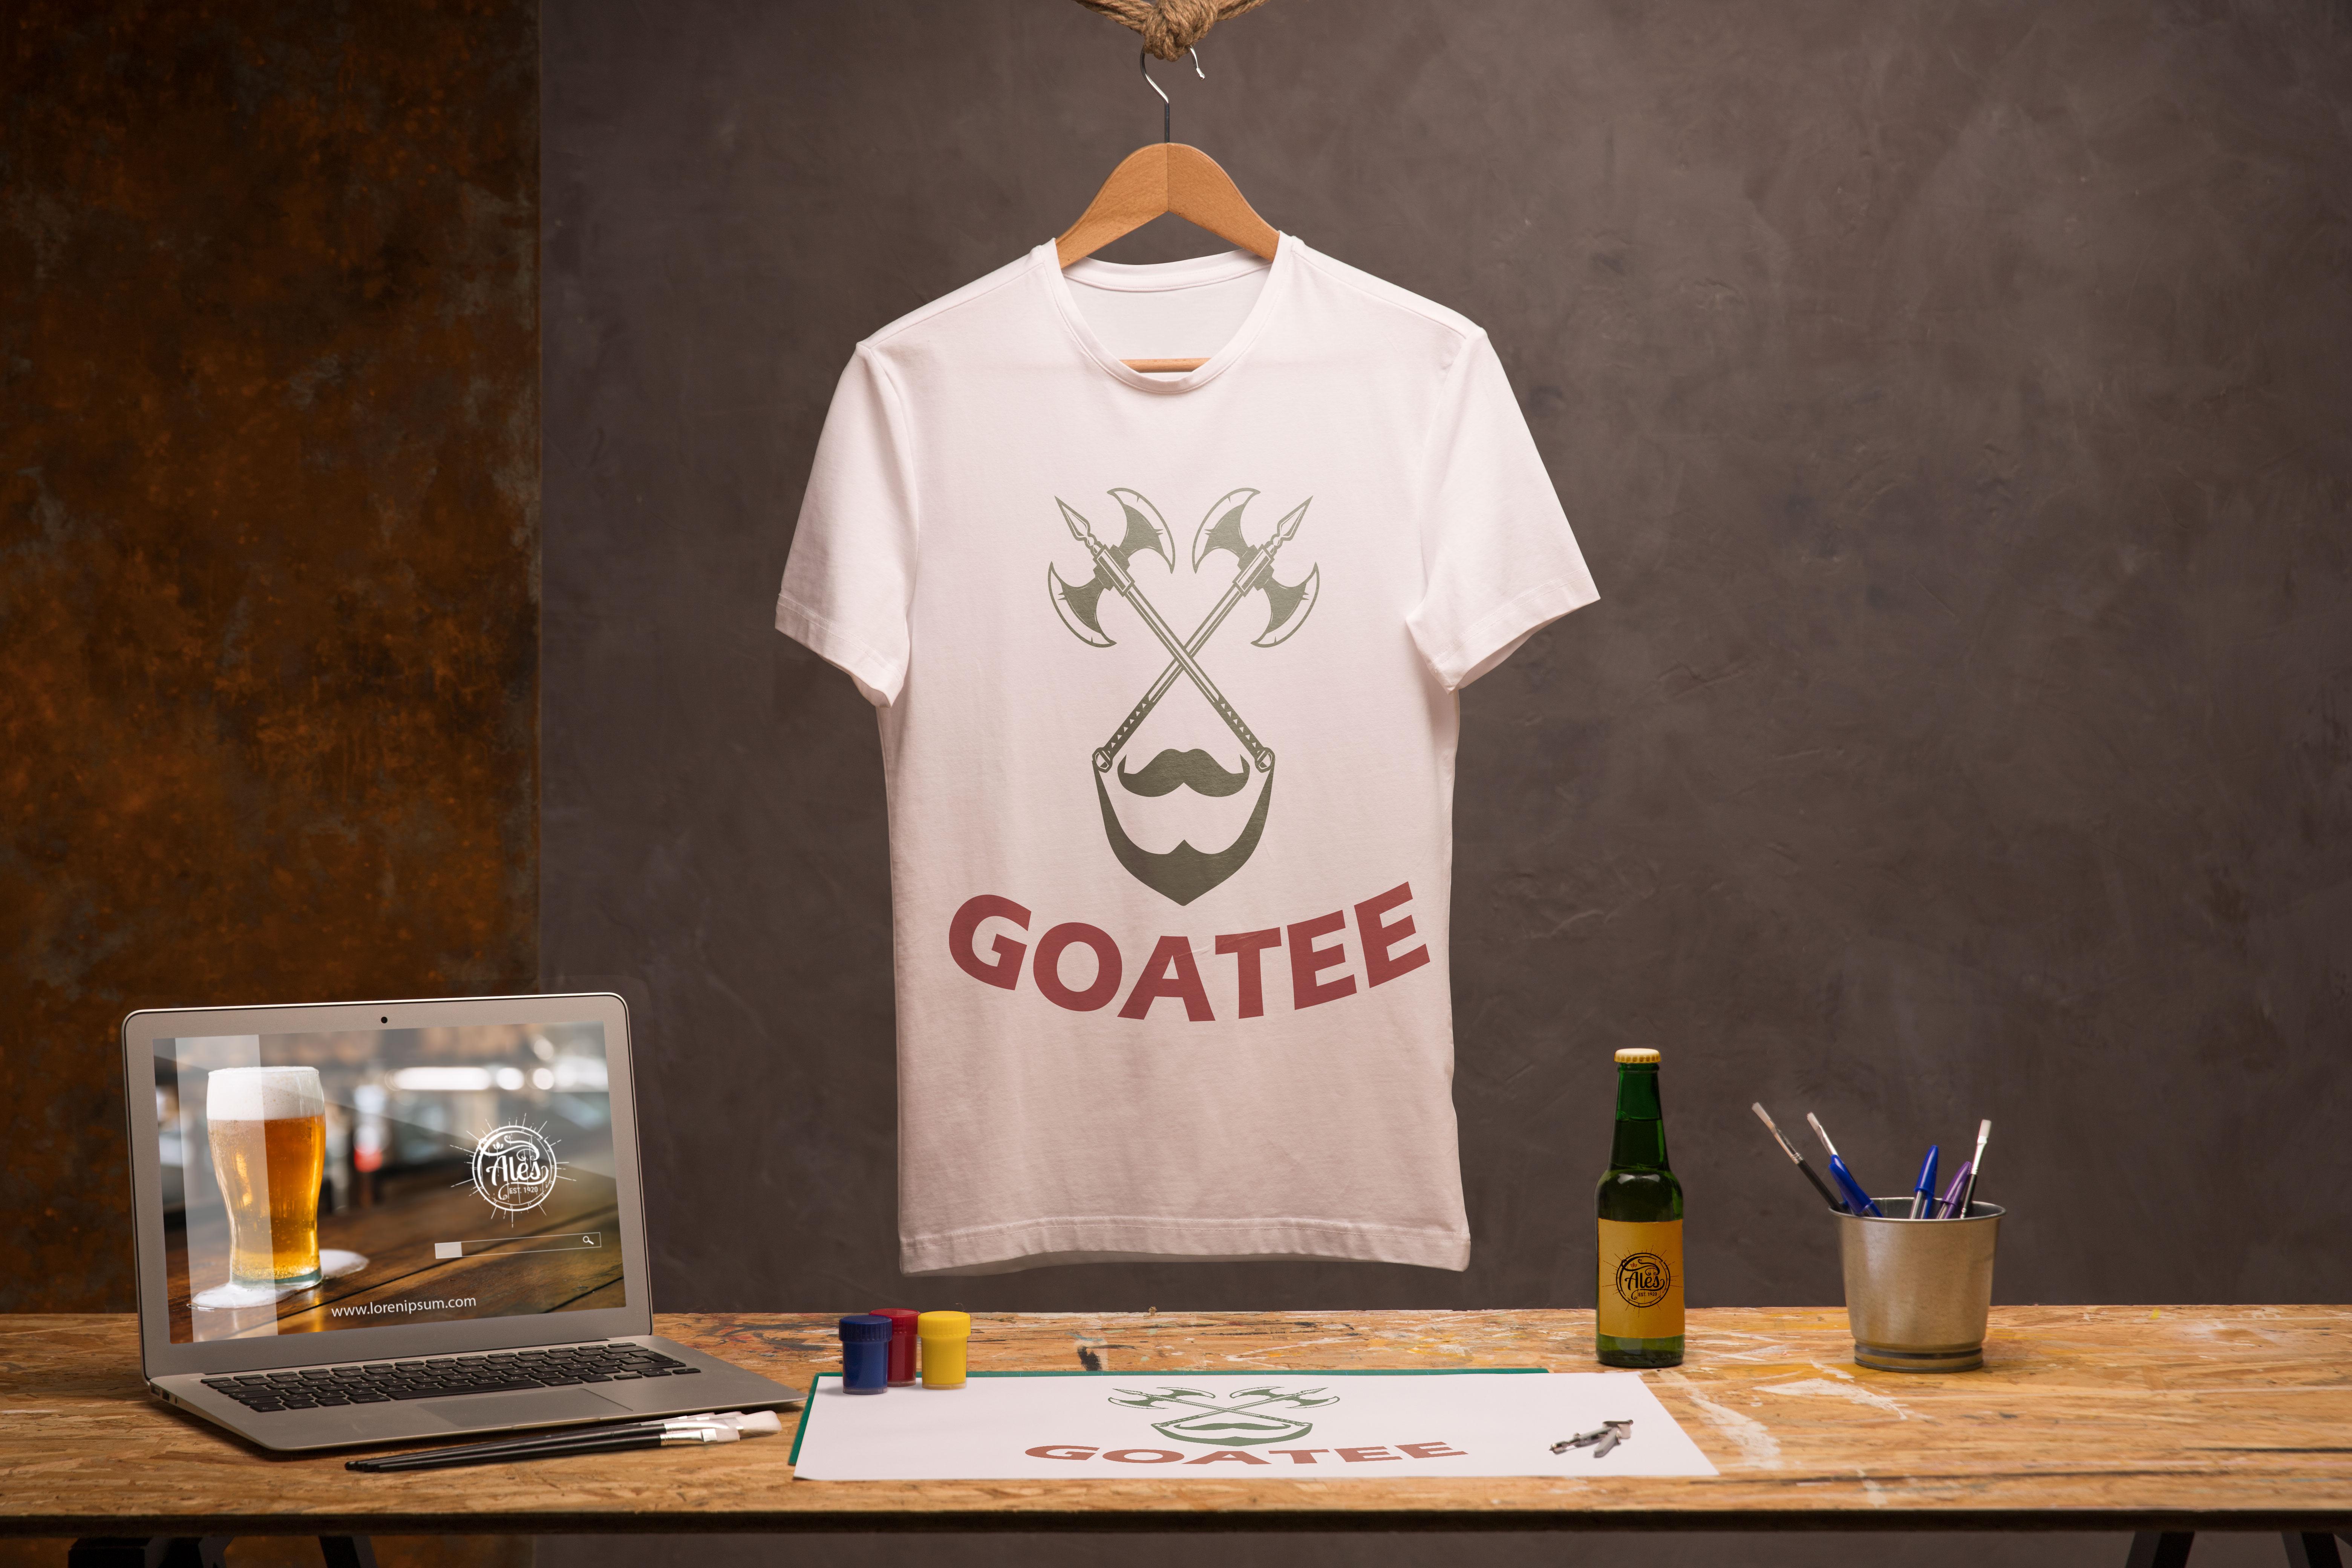 I will make high quality t-shirts designs